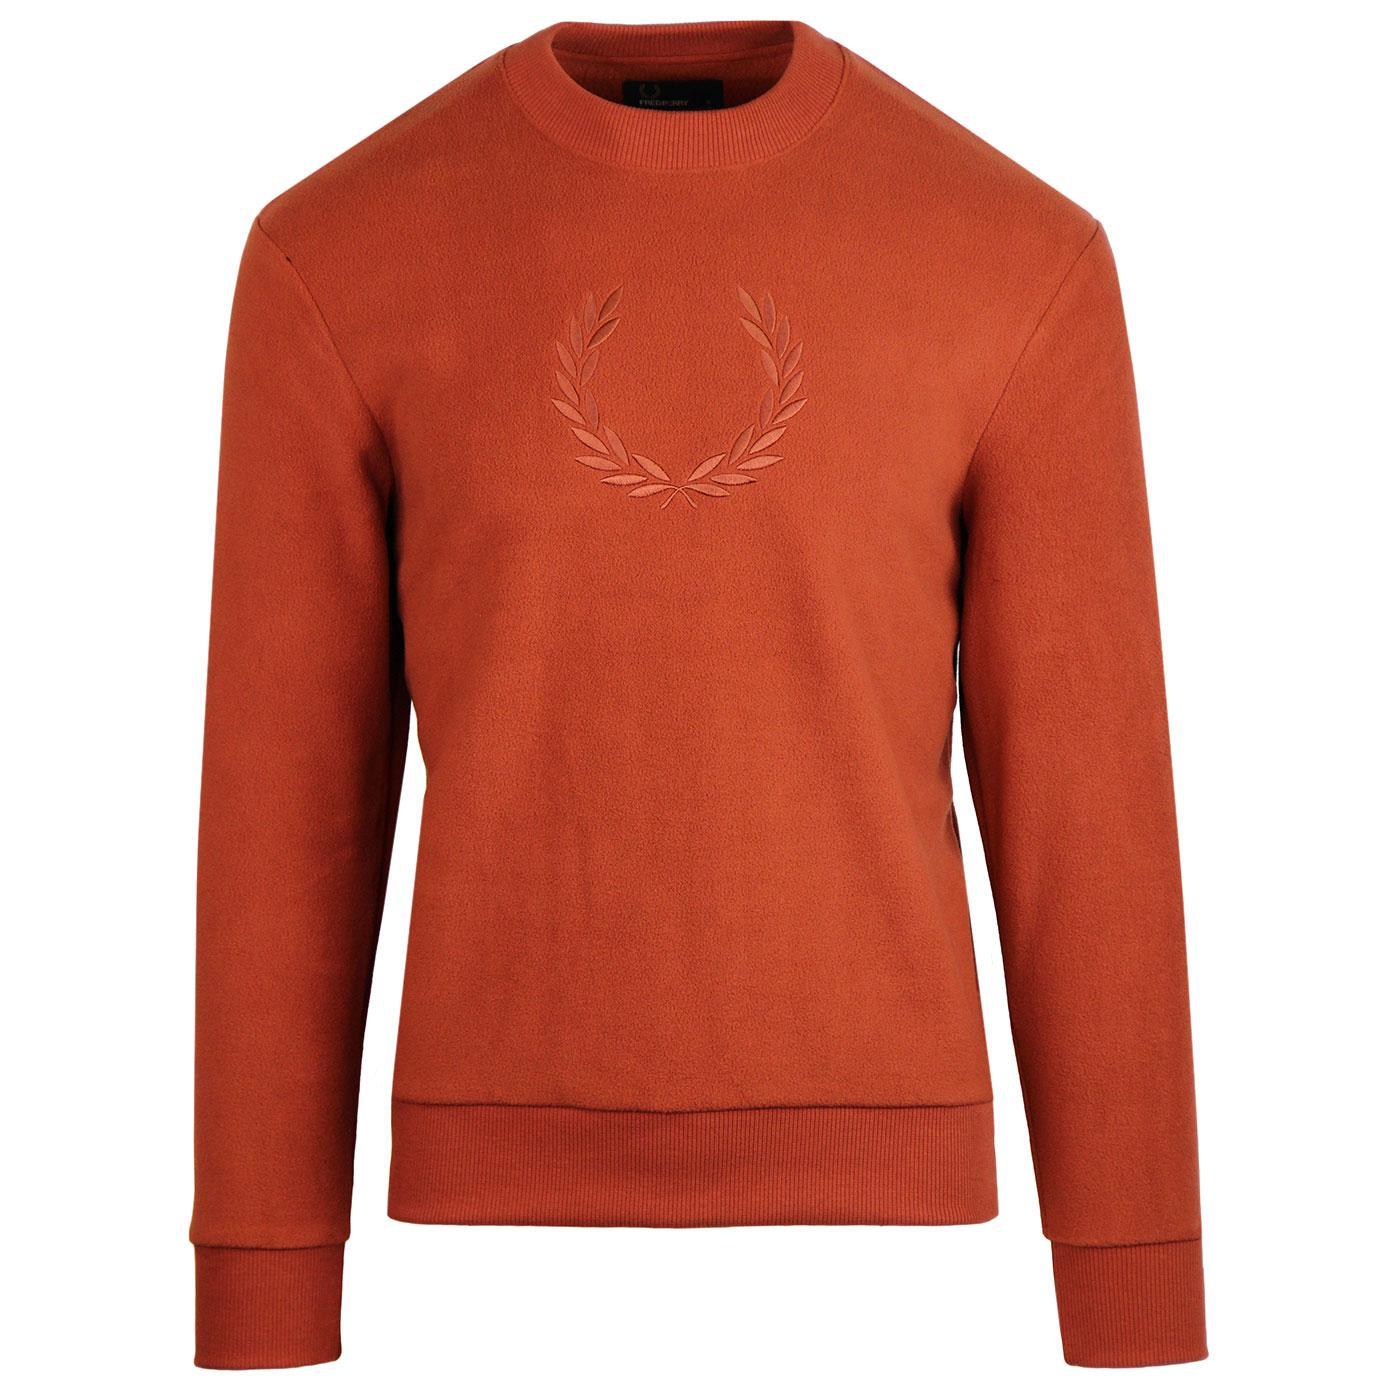 FRED PERRY Men's Retro Fleece Sweatshirt (Paprika)